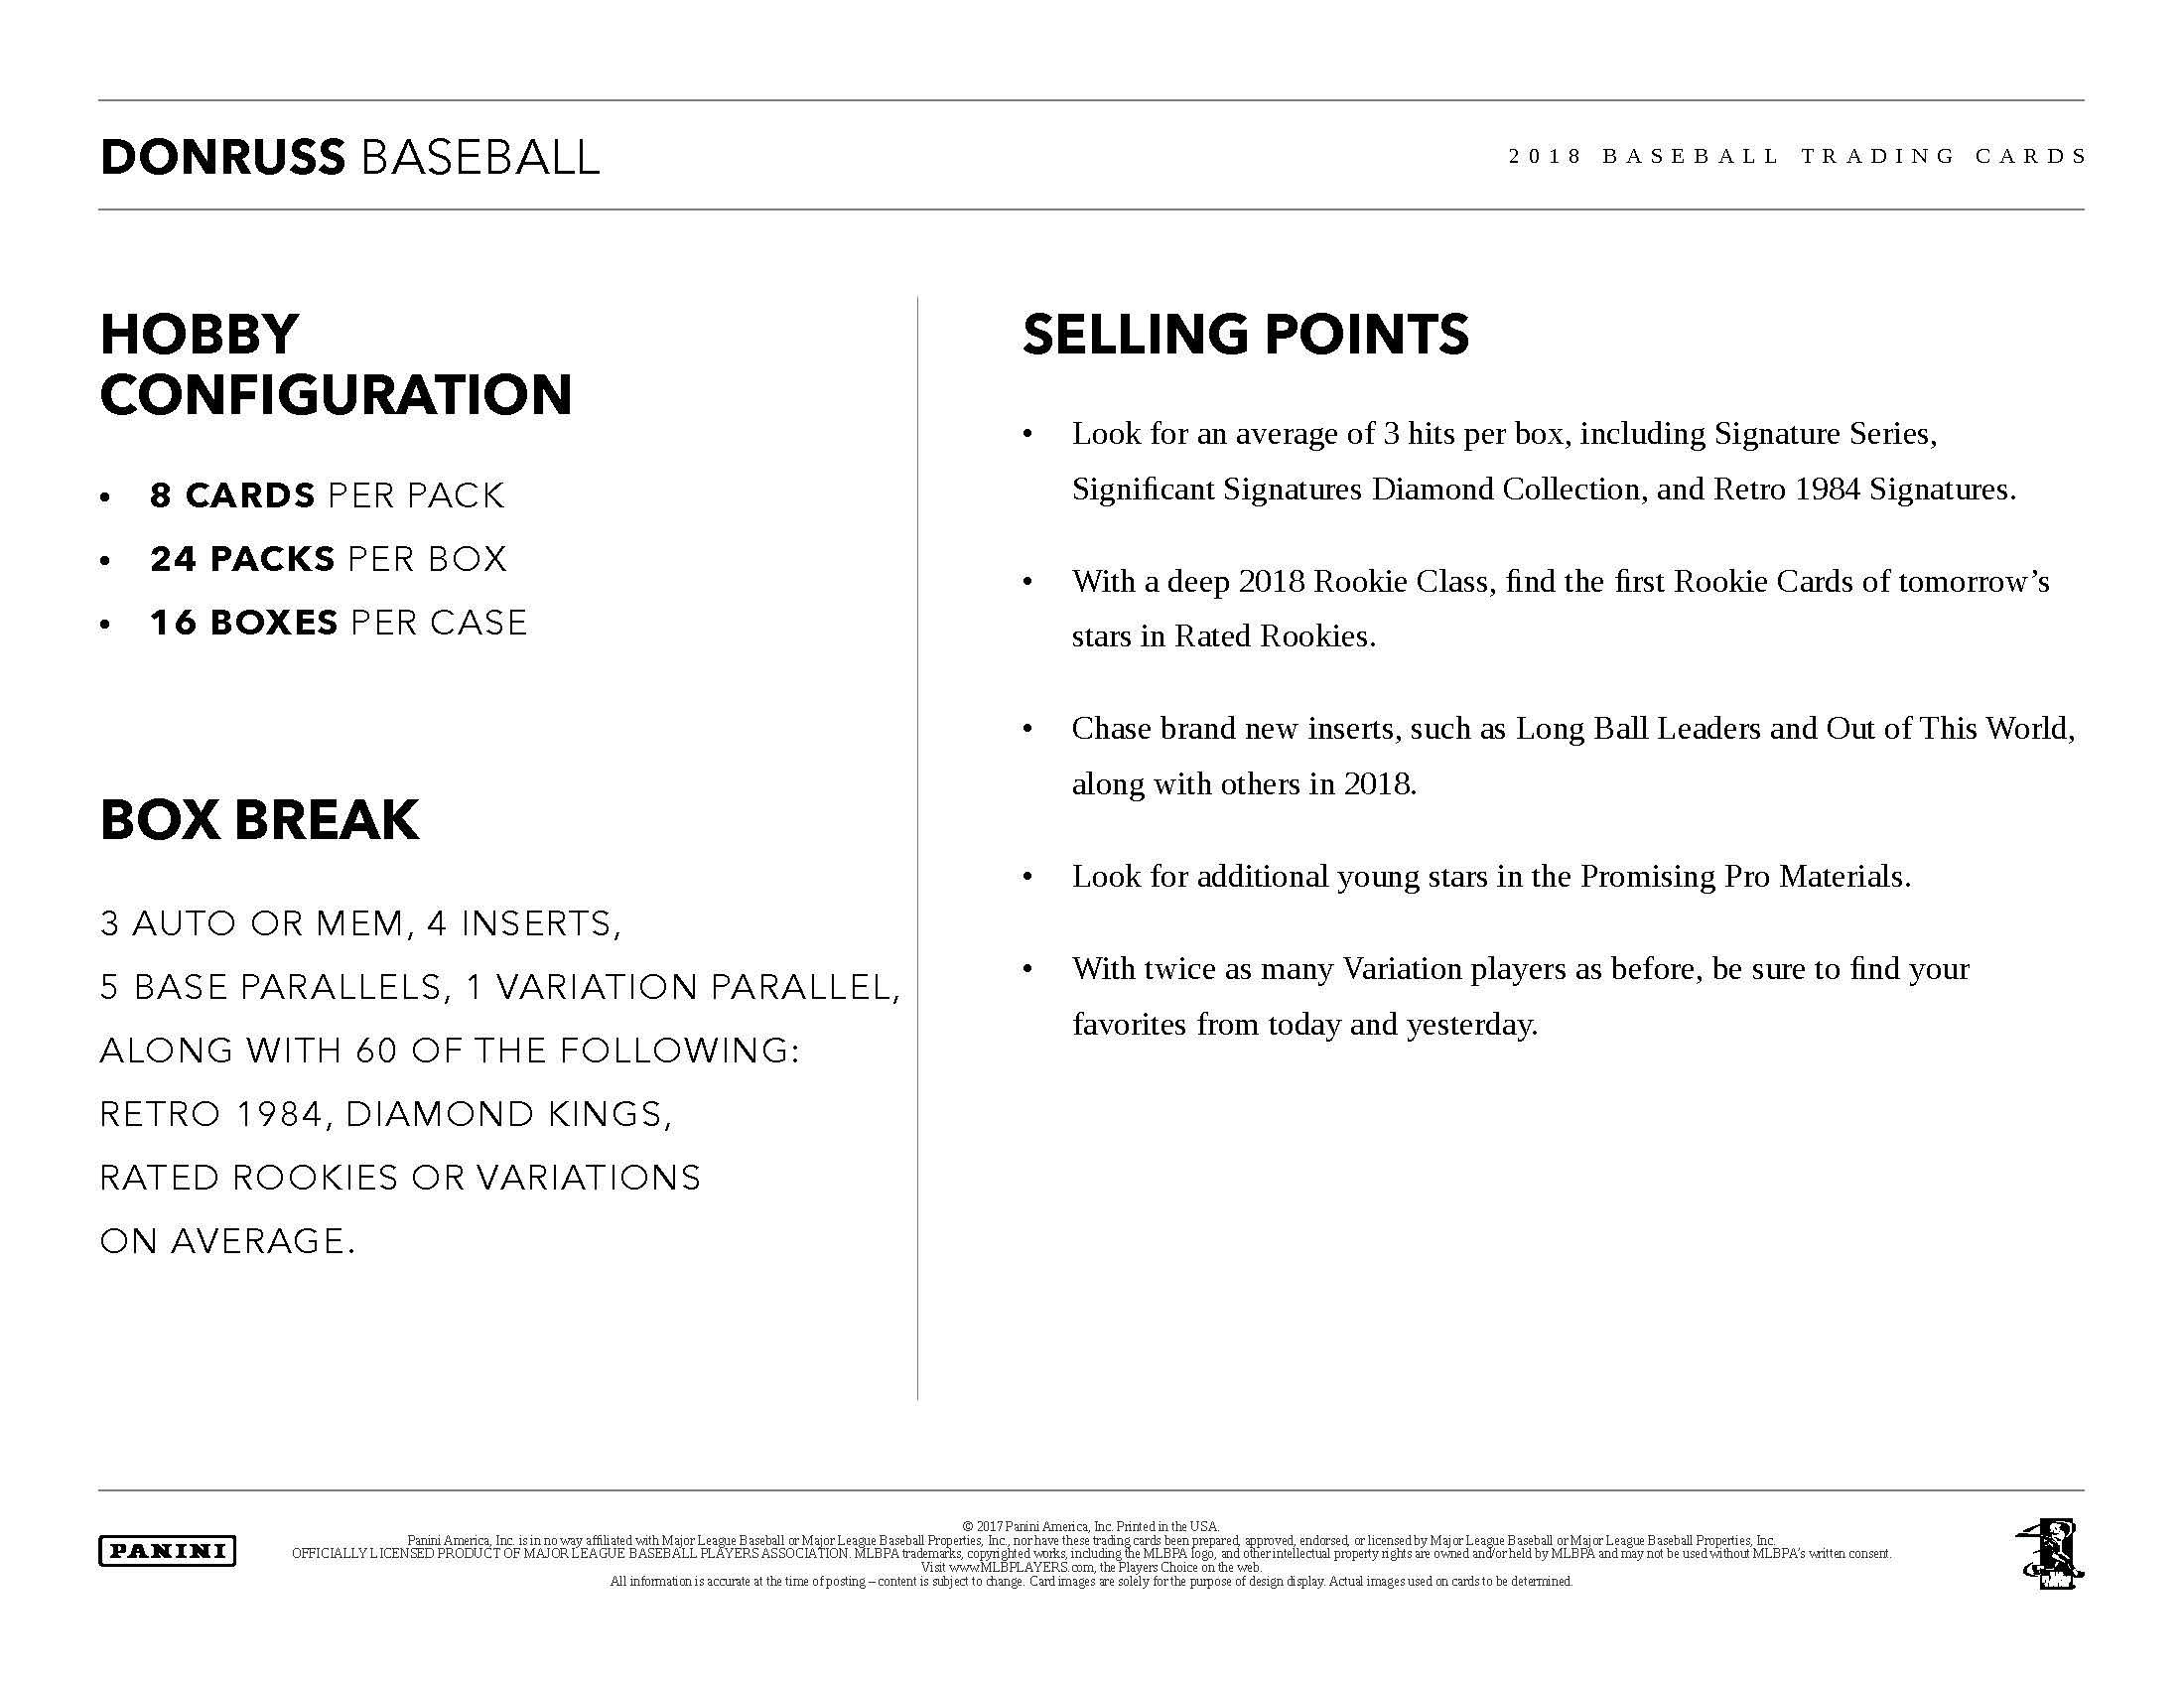 Baseball Card Checklist Spreadsheet Throughout 2018 Donruss Baseball Cards